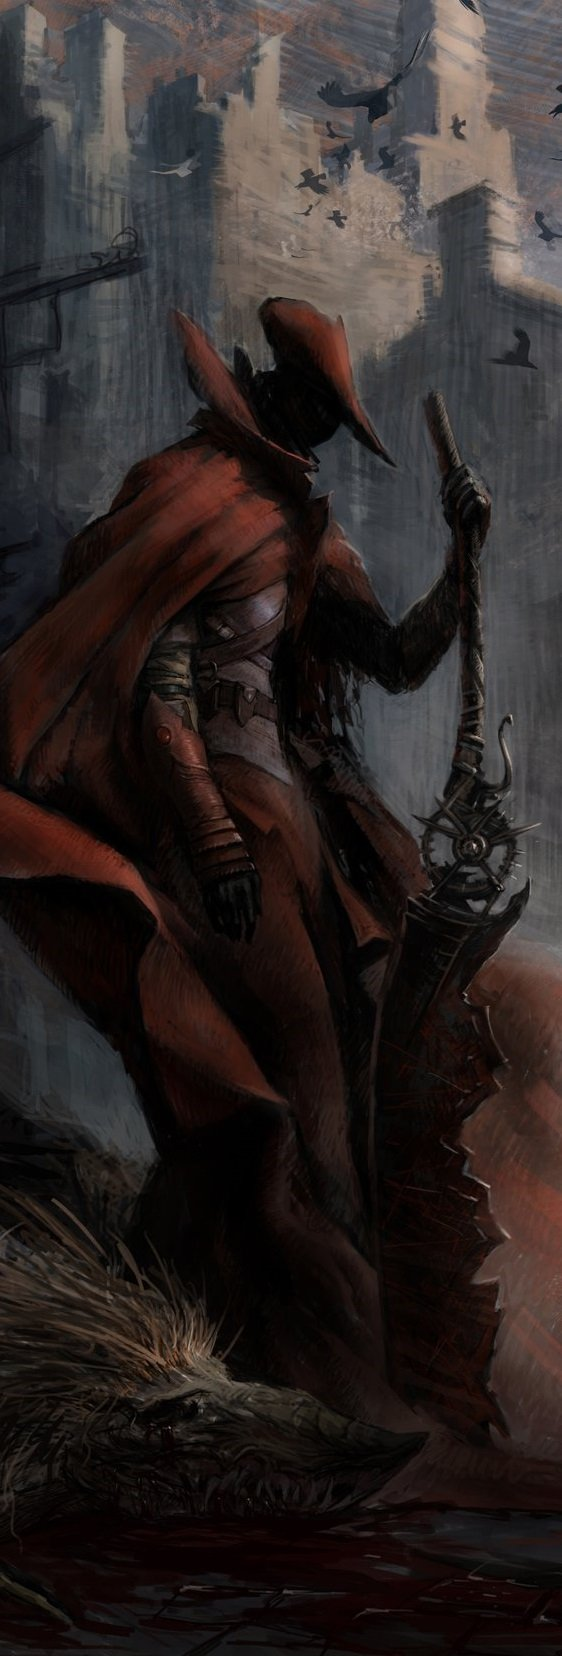 Рецензия на Bloodborne | Канобу - Изображение 2